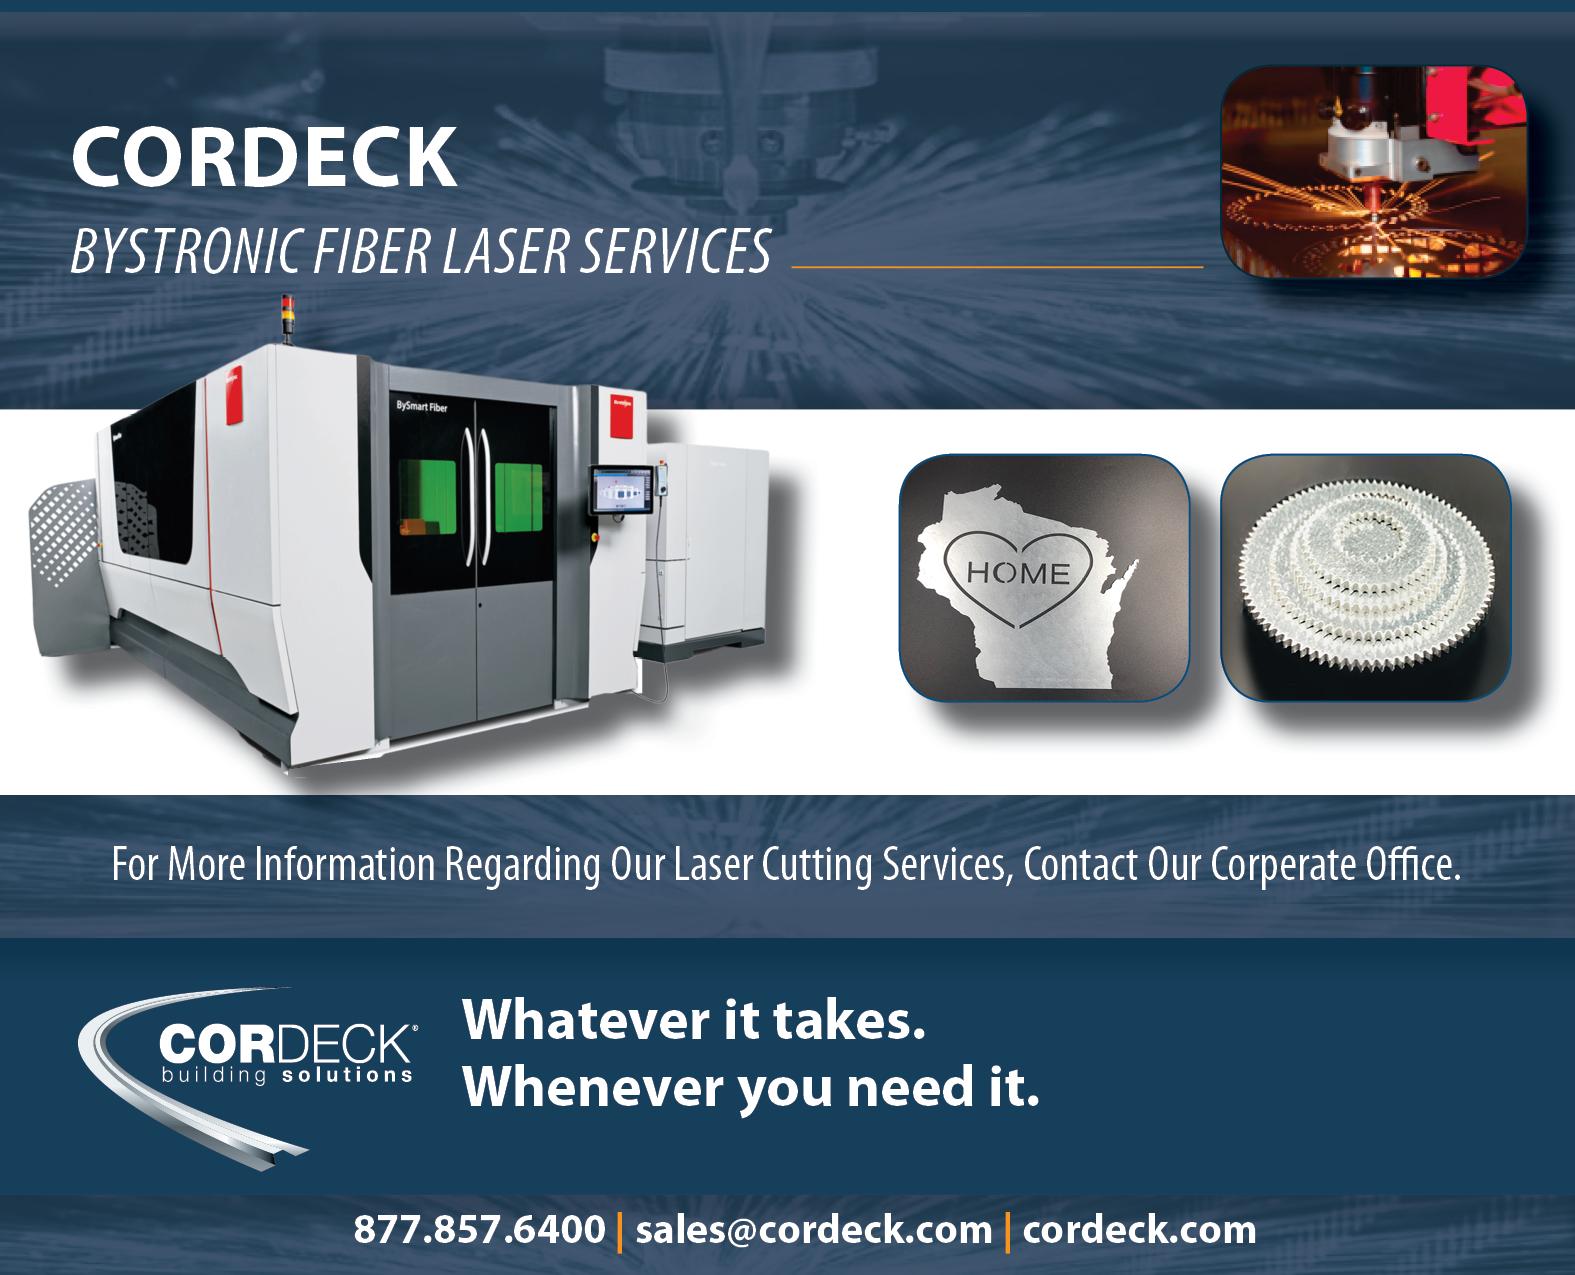 Bystronic Fiber Laser Services